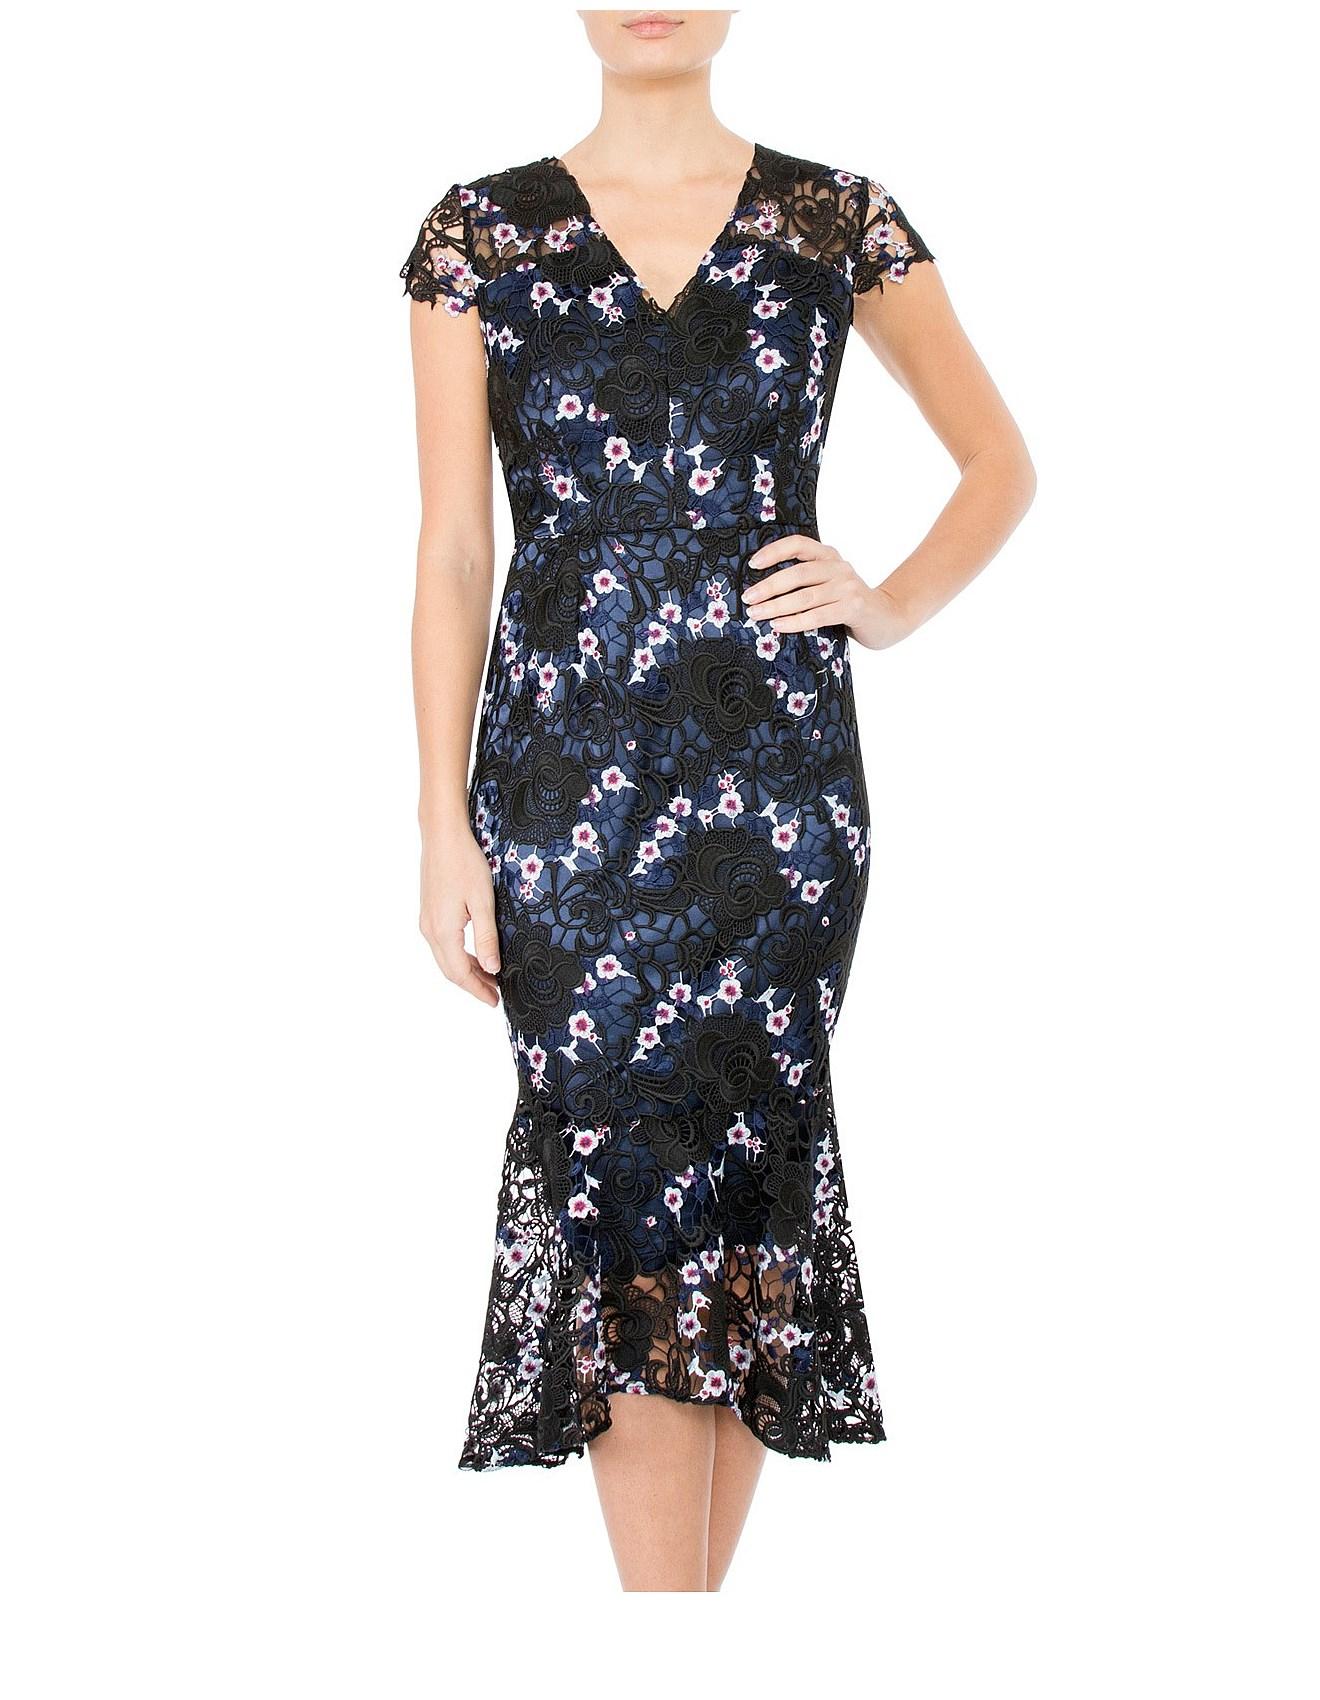 Jones david evening dresses